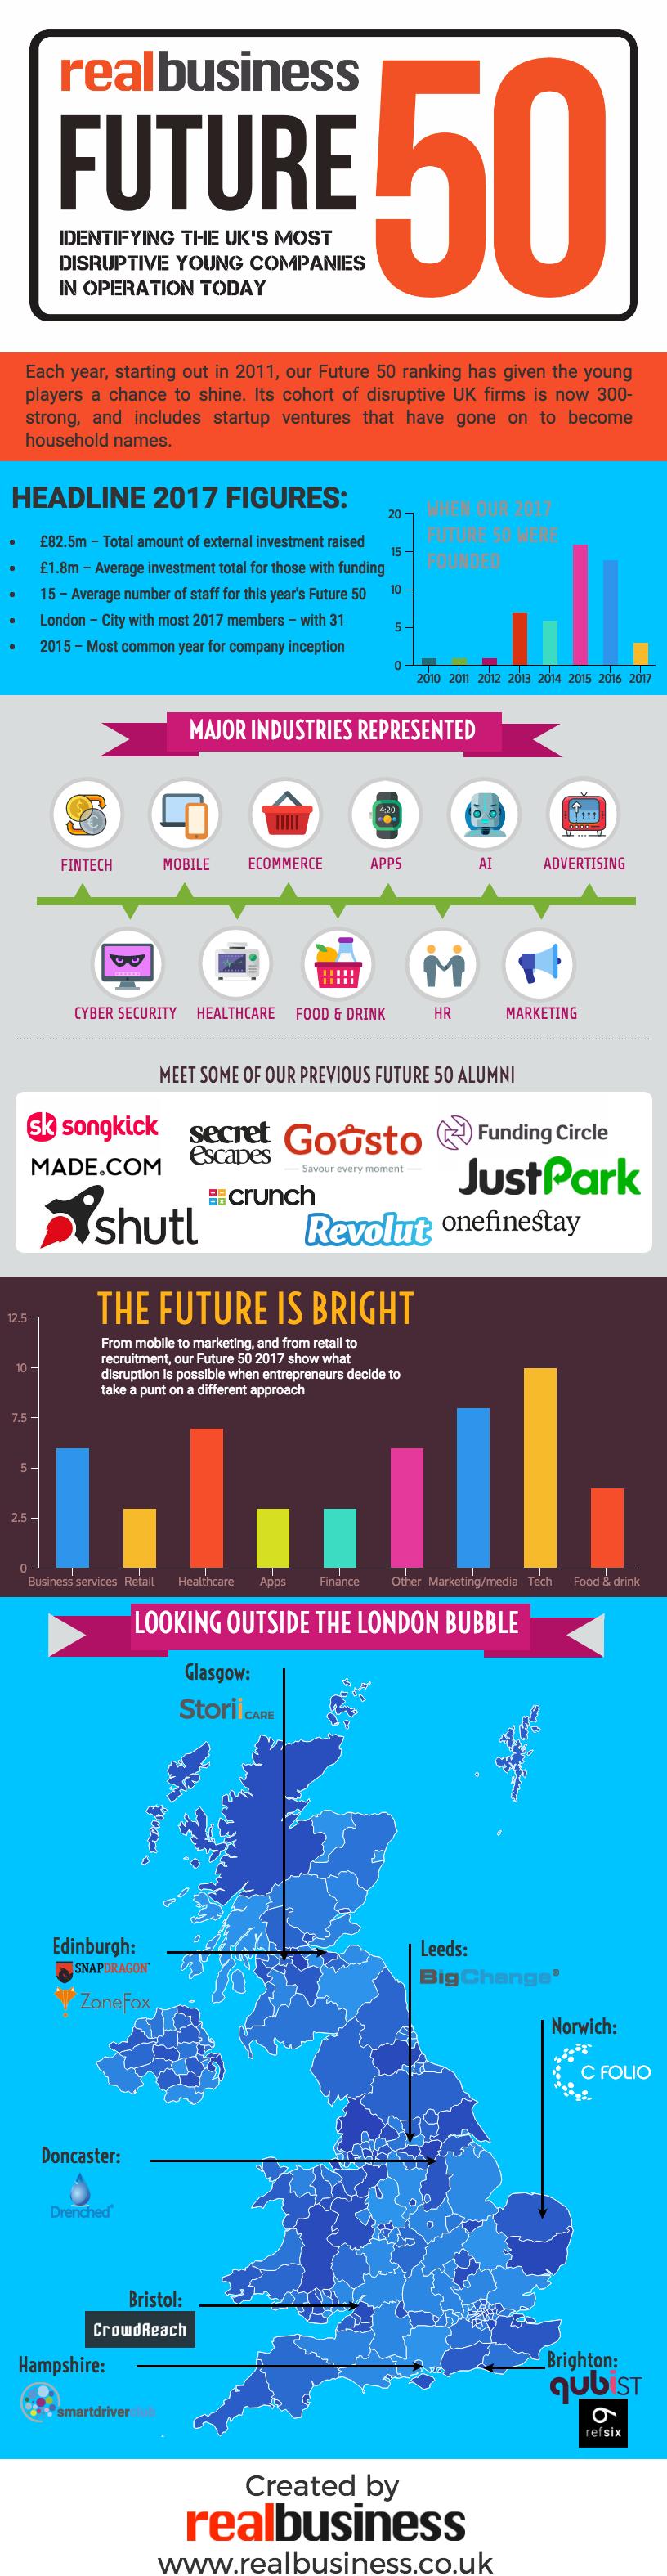 Future 50 2017 infographic